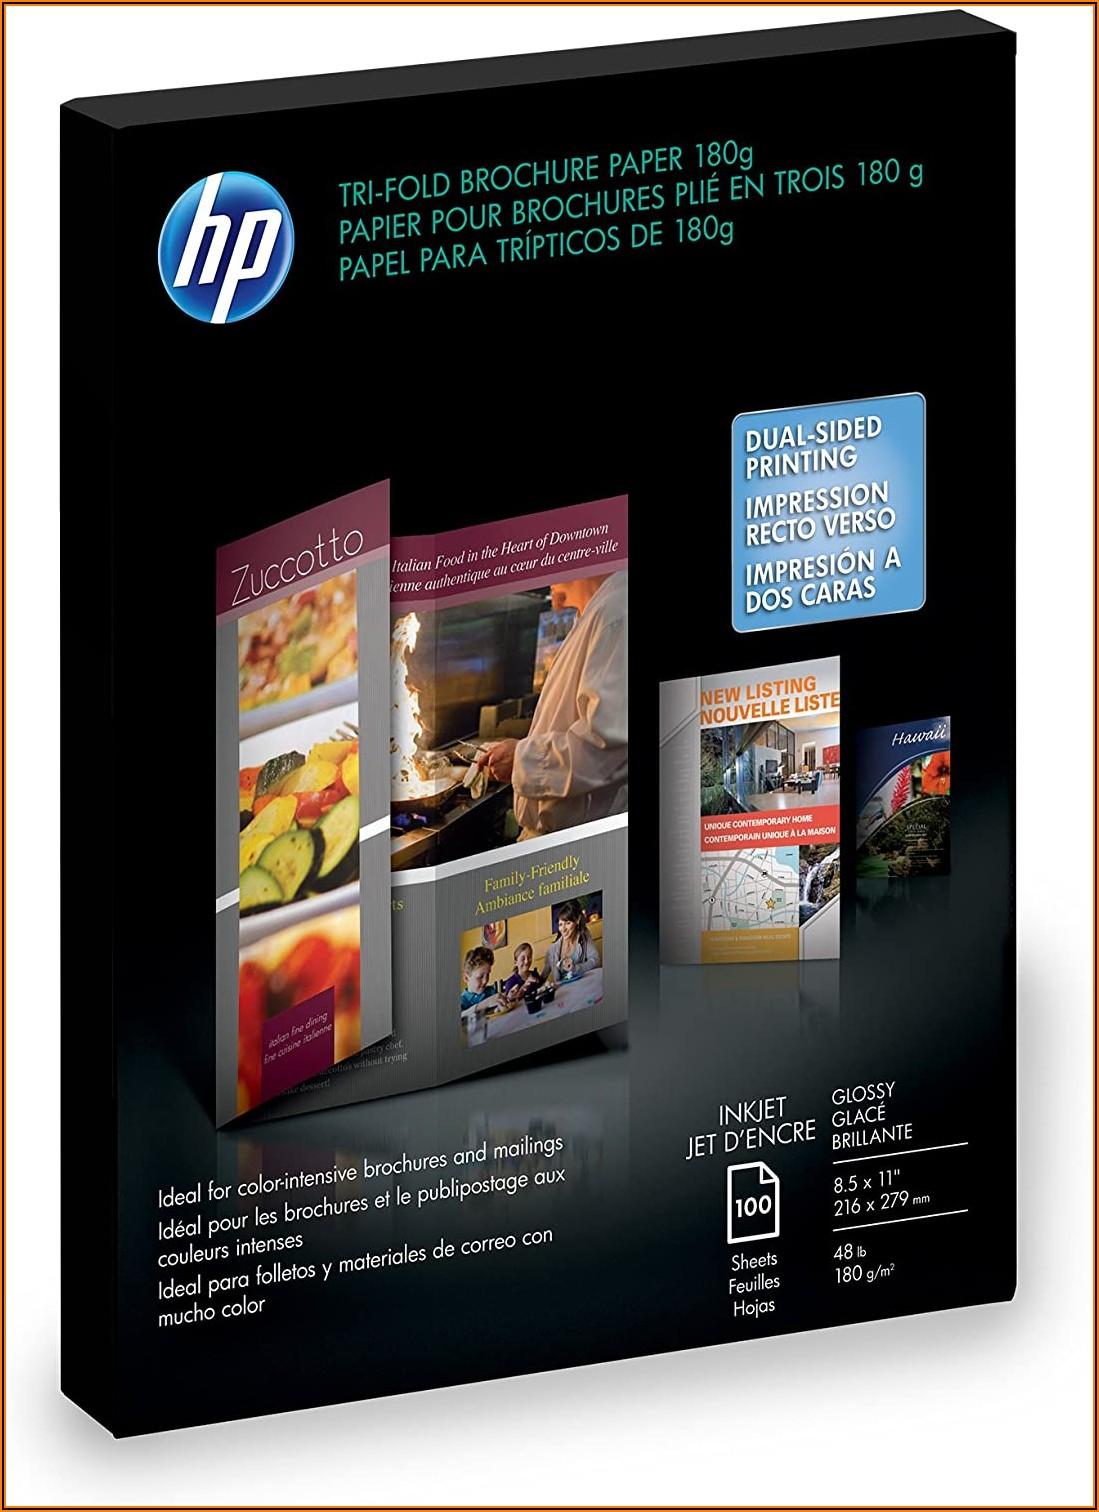 Hp Inkjet Glossy Tri Fold Brochure Paper